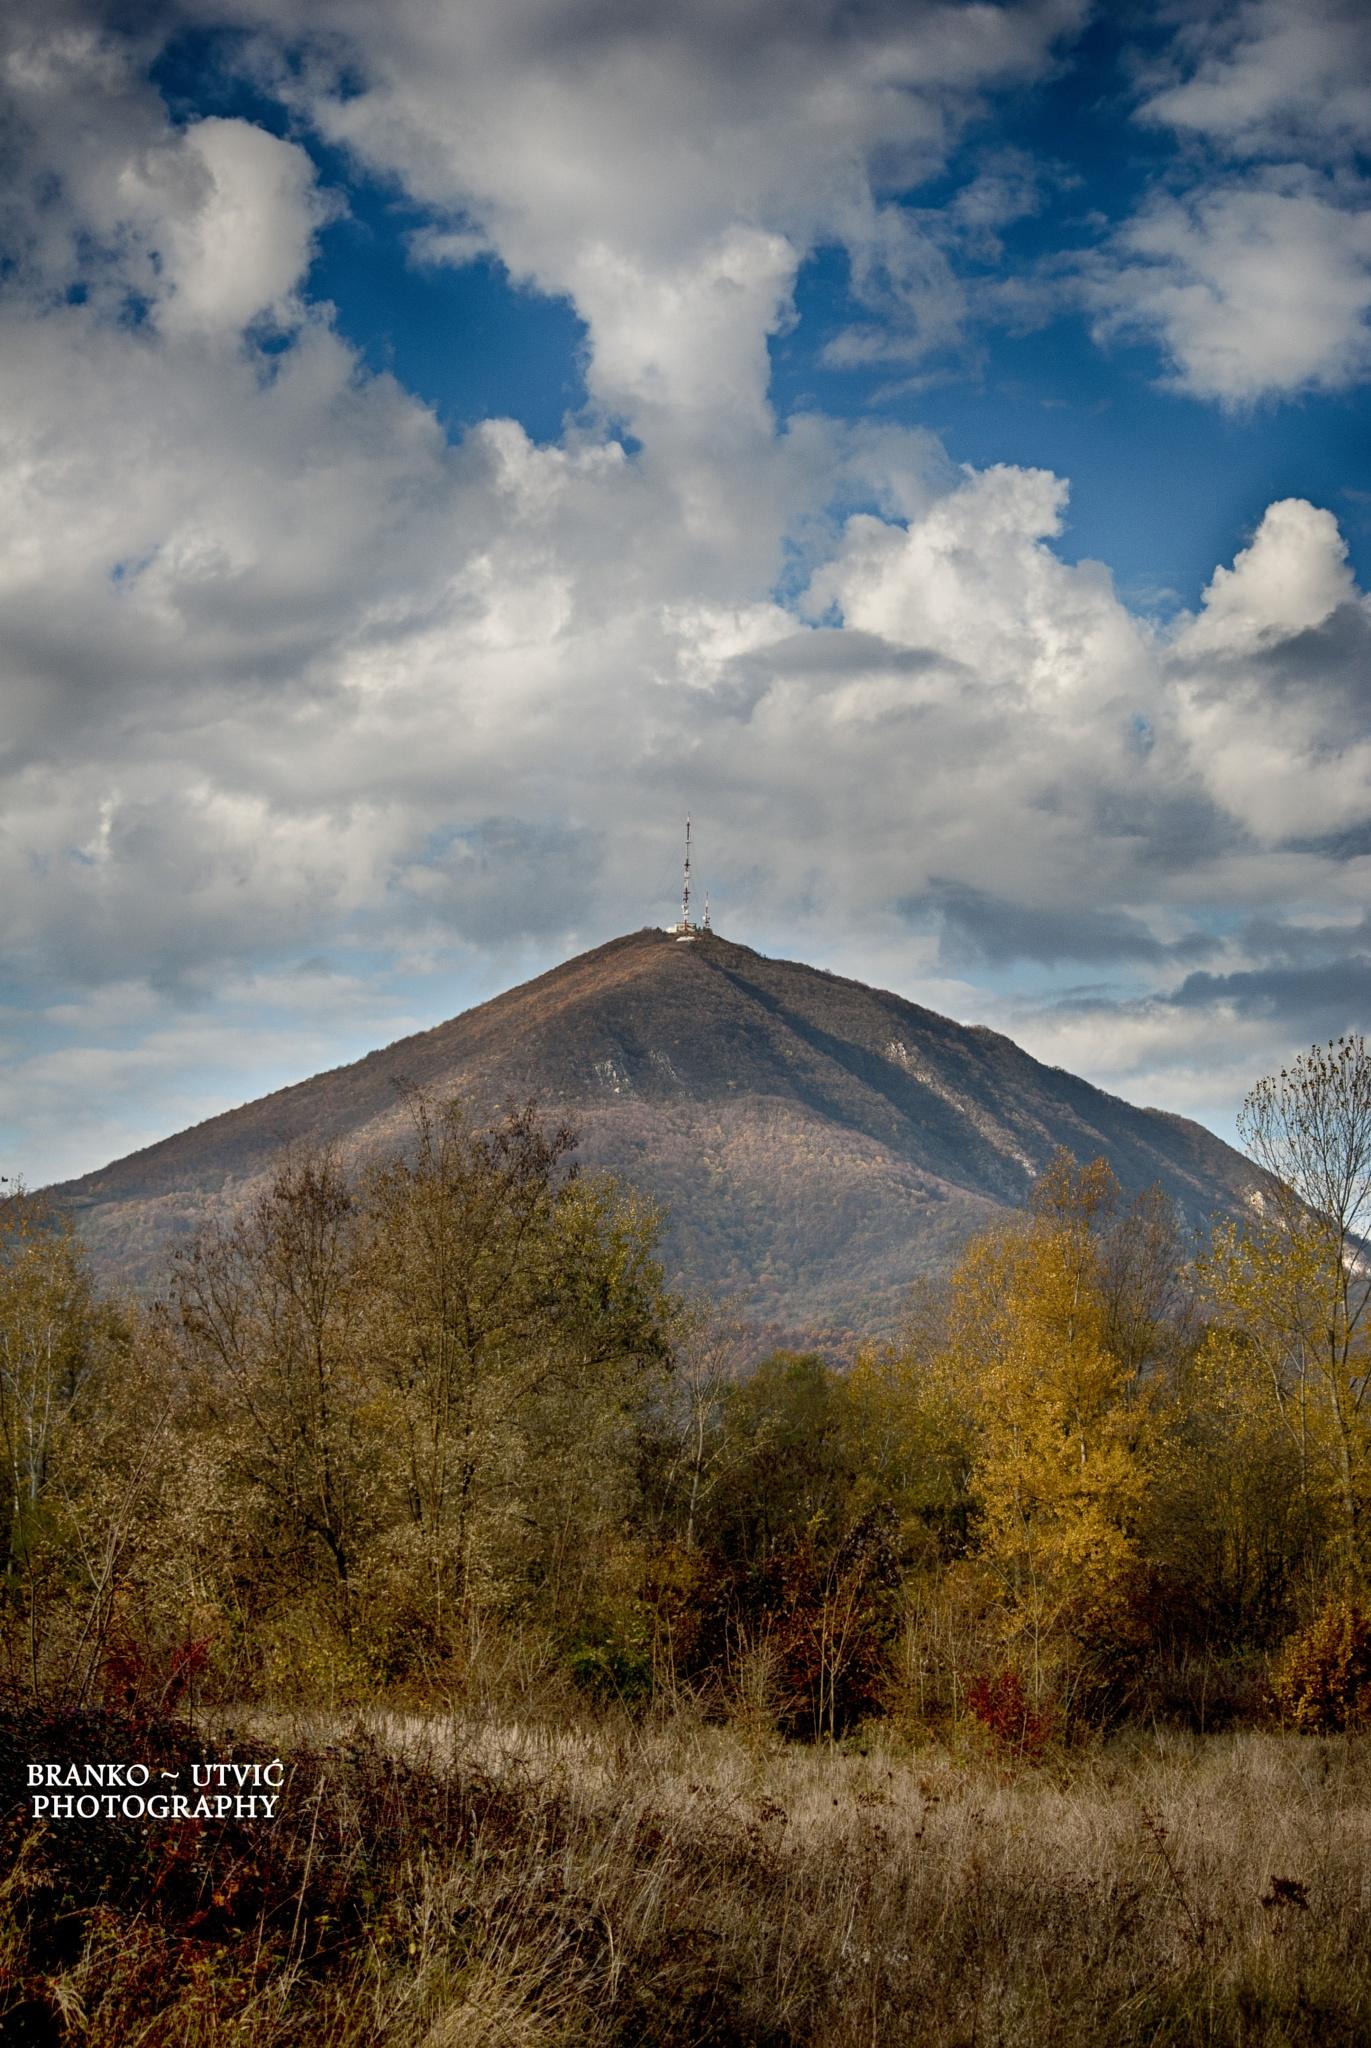 Mountain Ovcar by branko.utvic